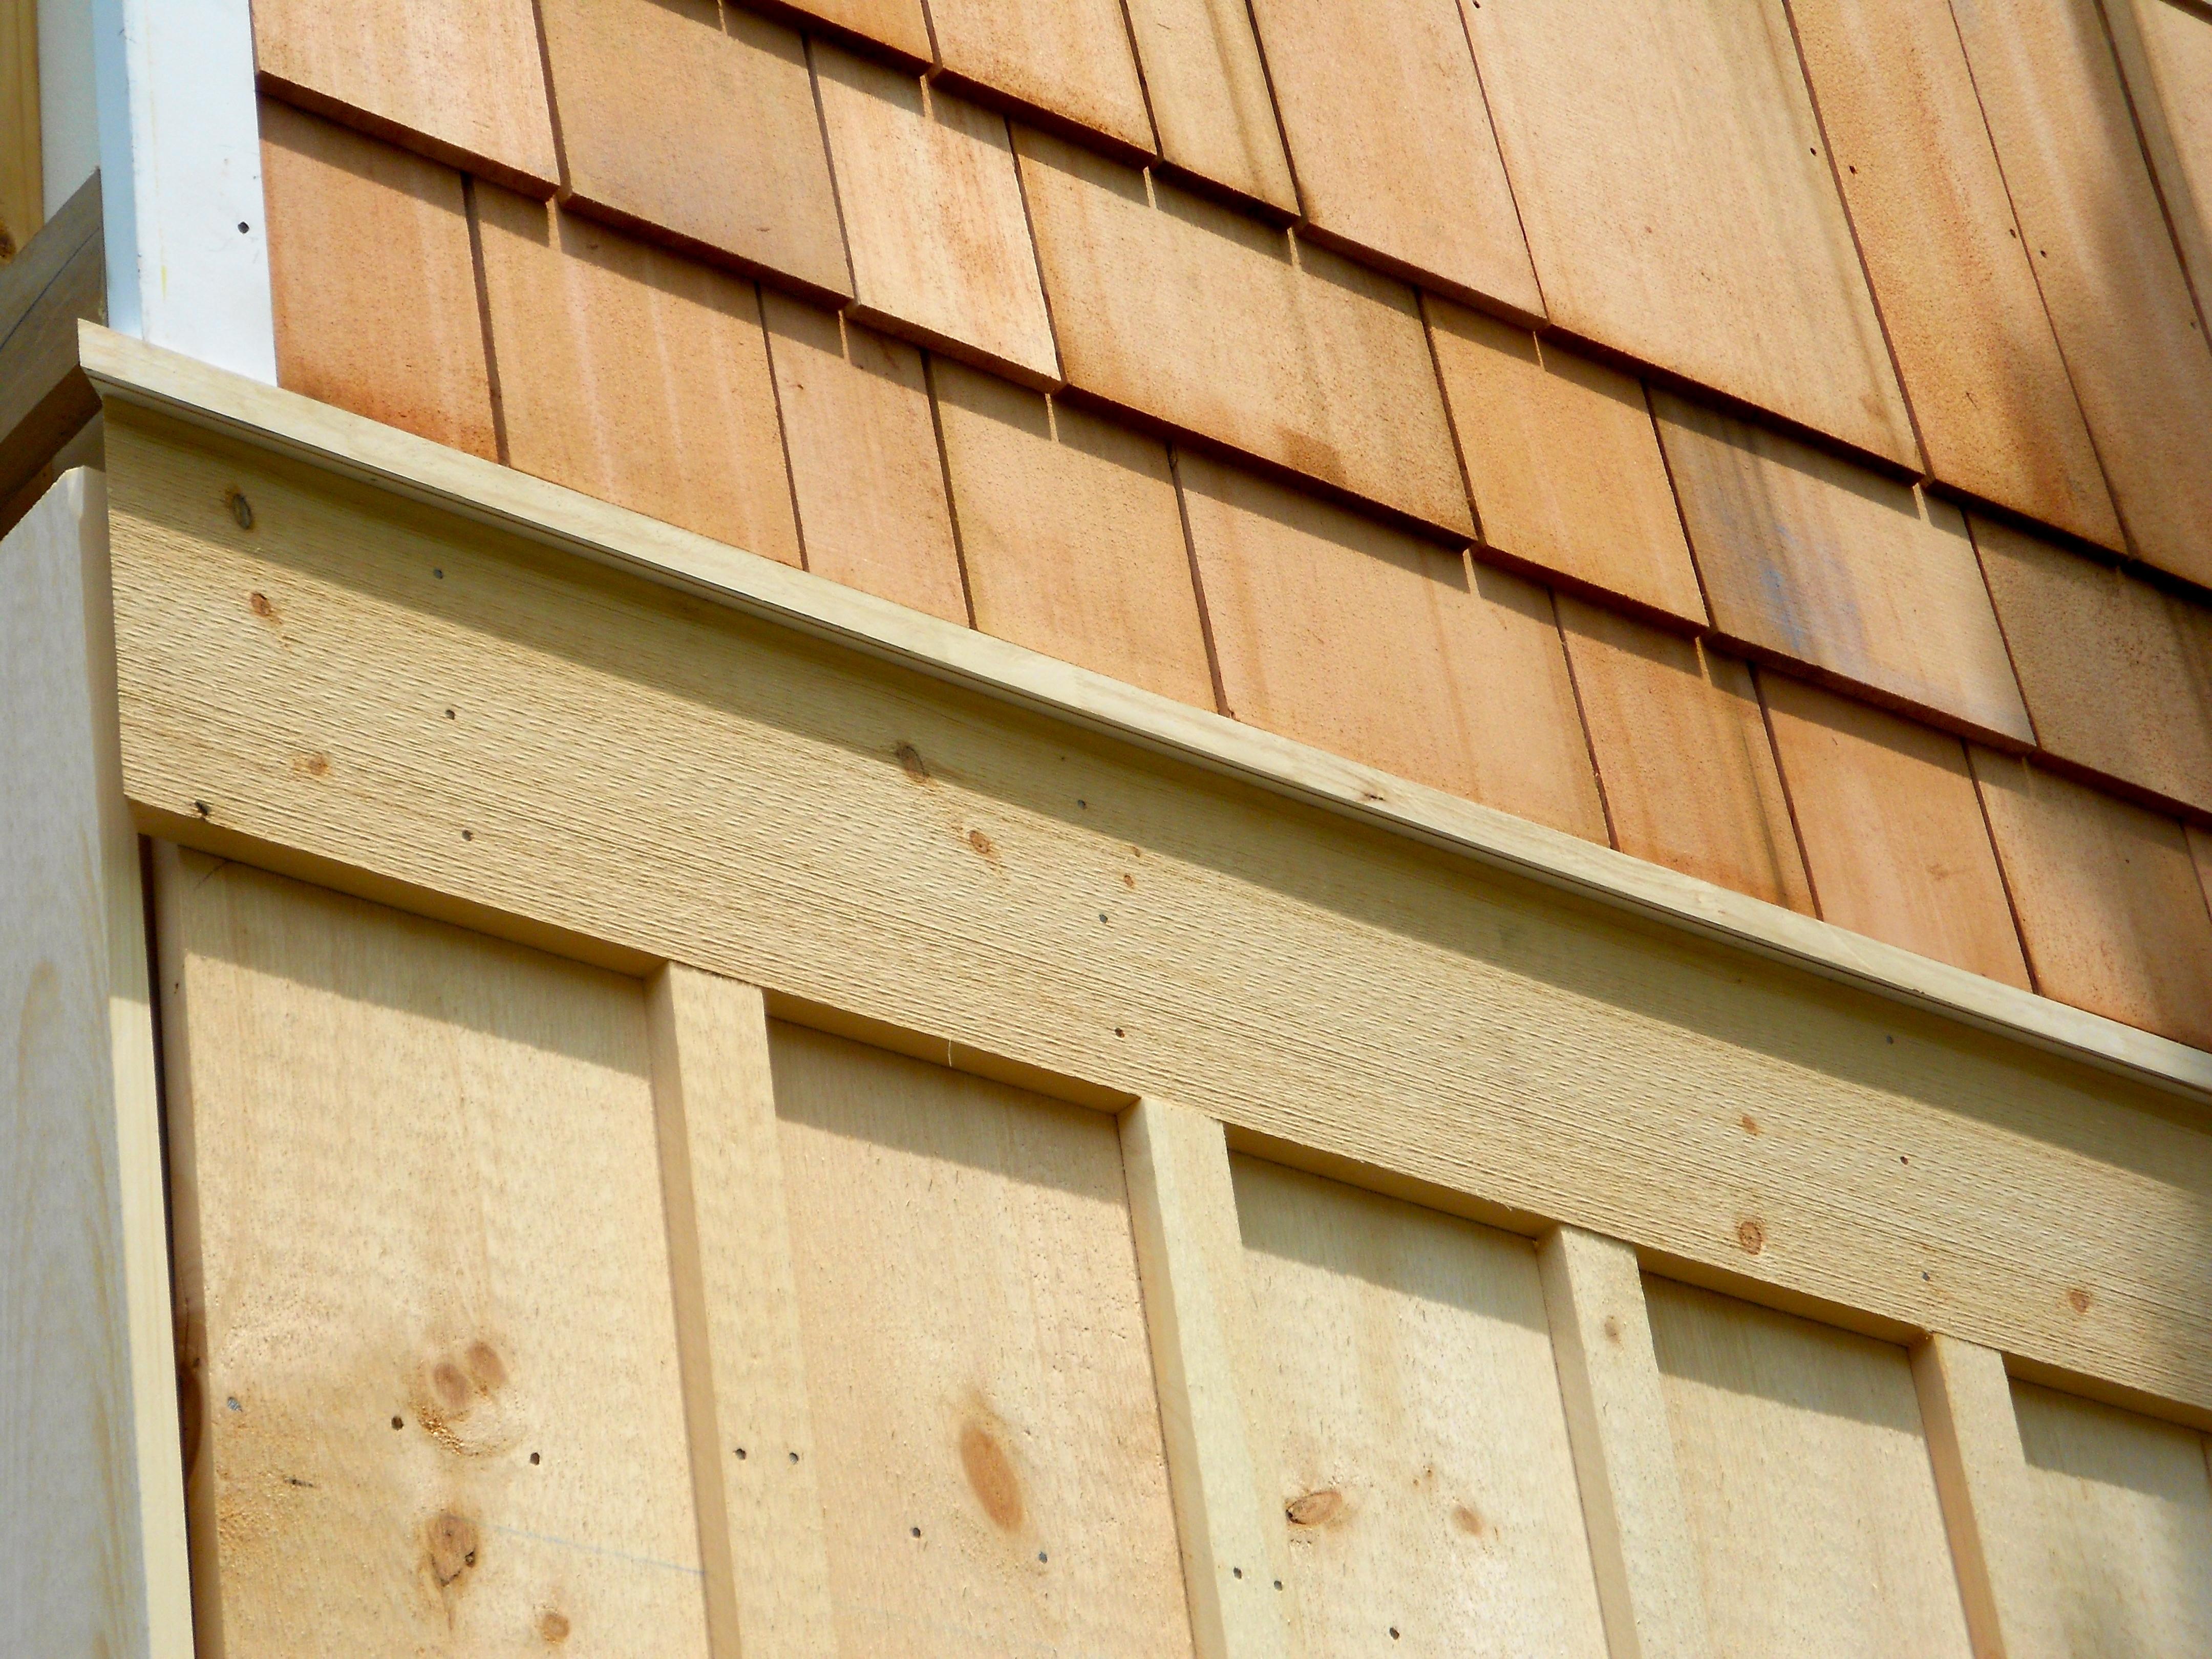 buzzard-progress-may-16-2012-006.jpg